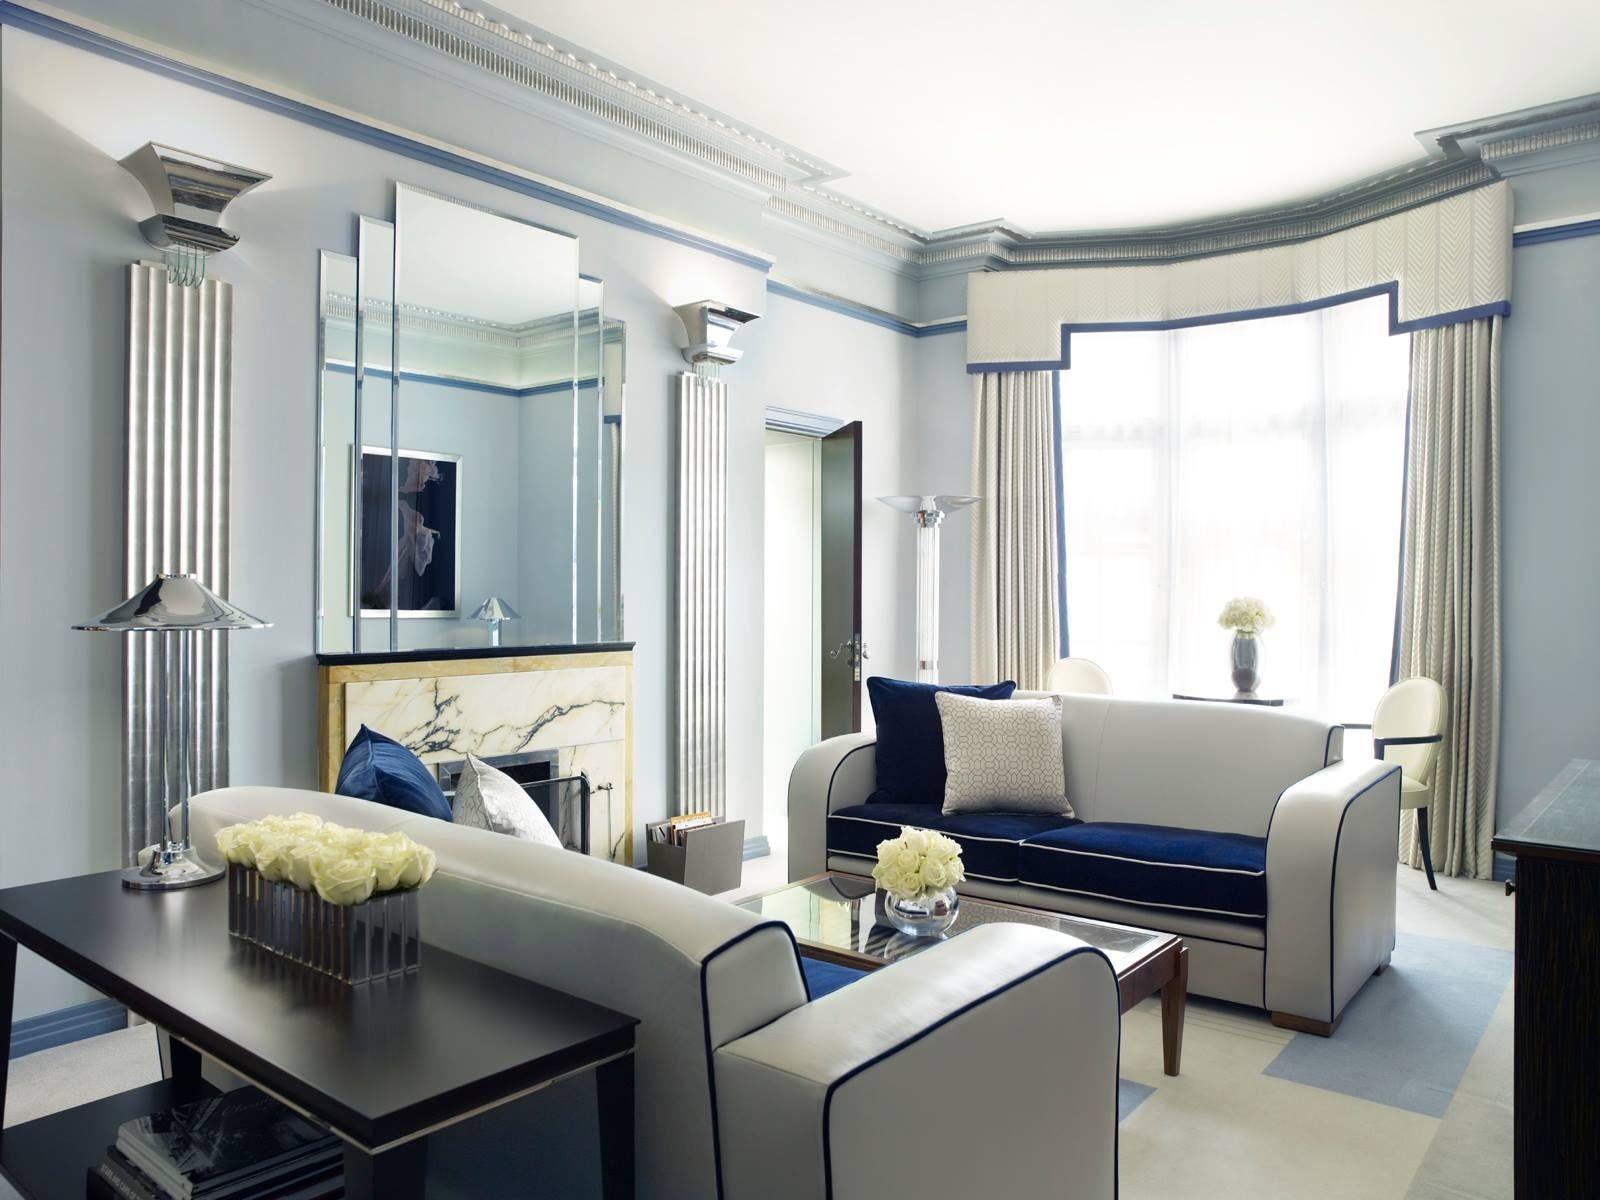 Art Deco - My Ideal Living Room!!